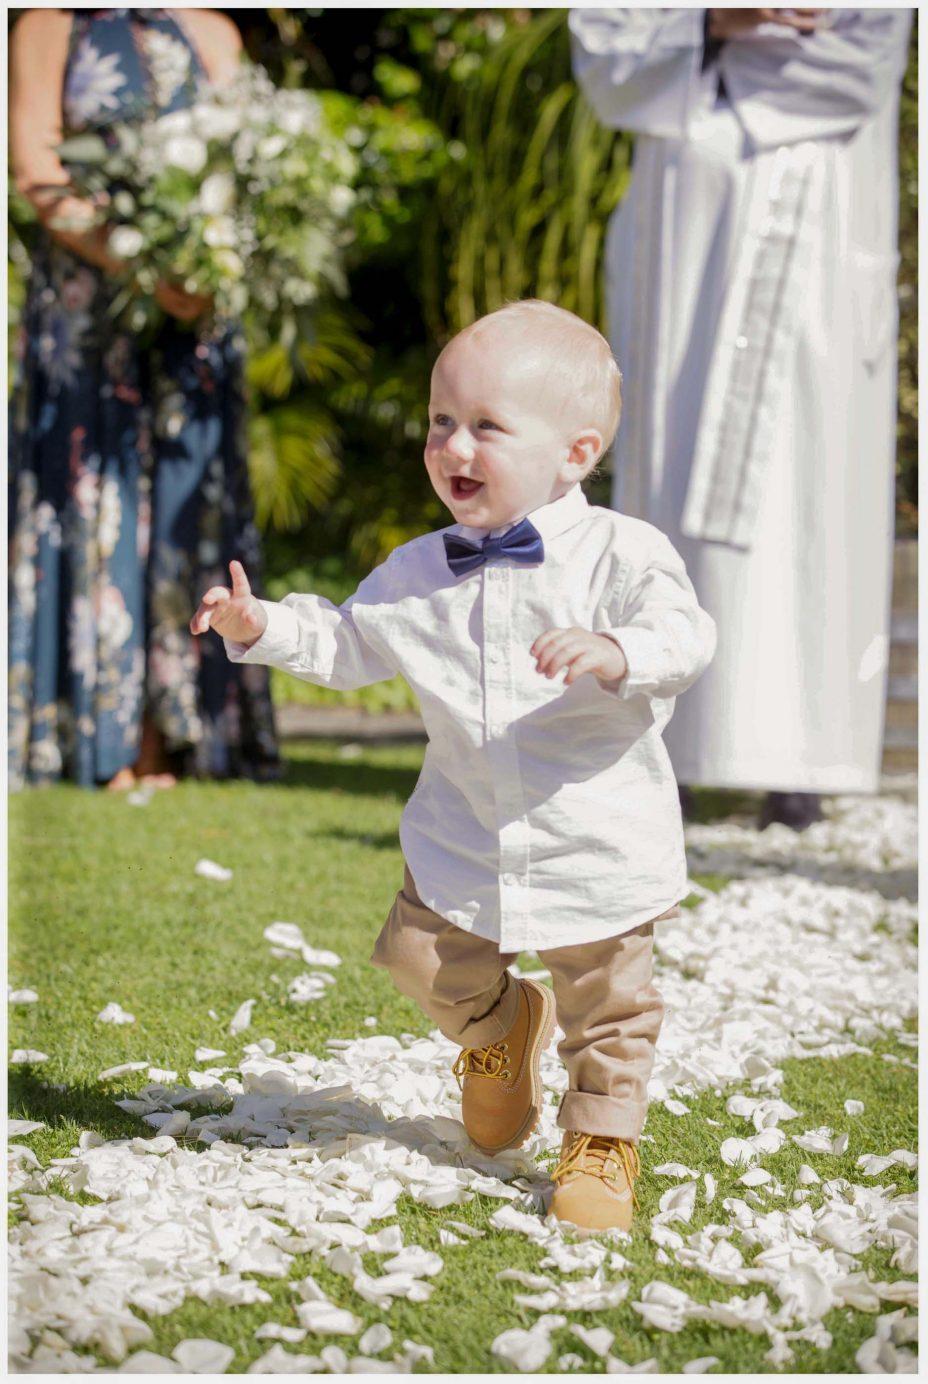 Cute baby pageboy in bow tie